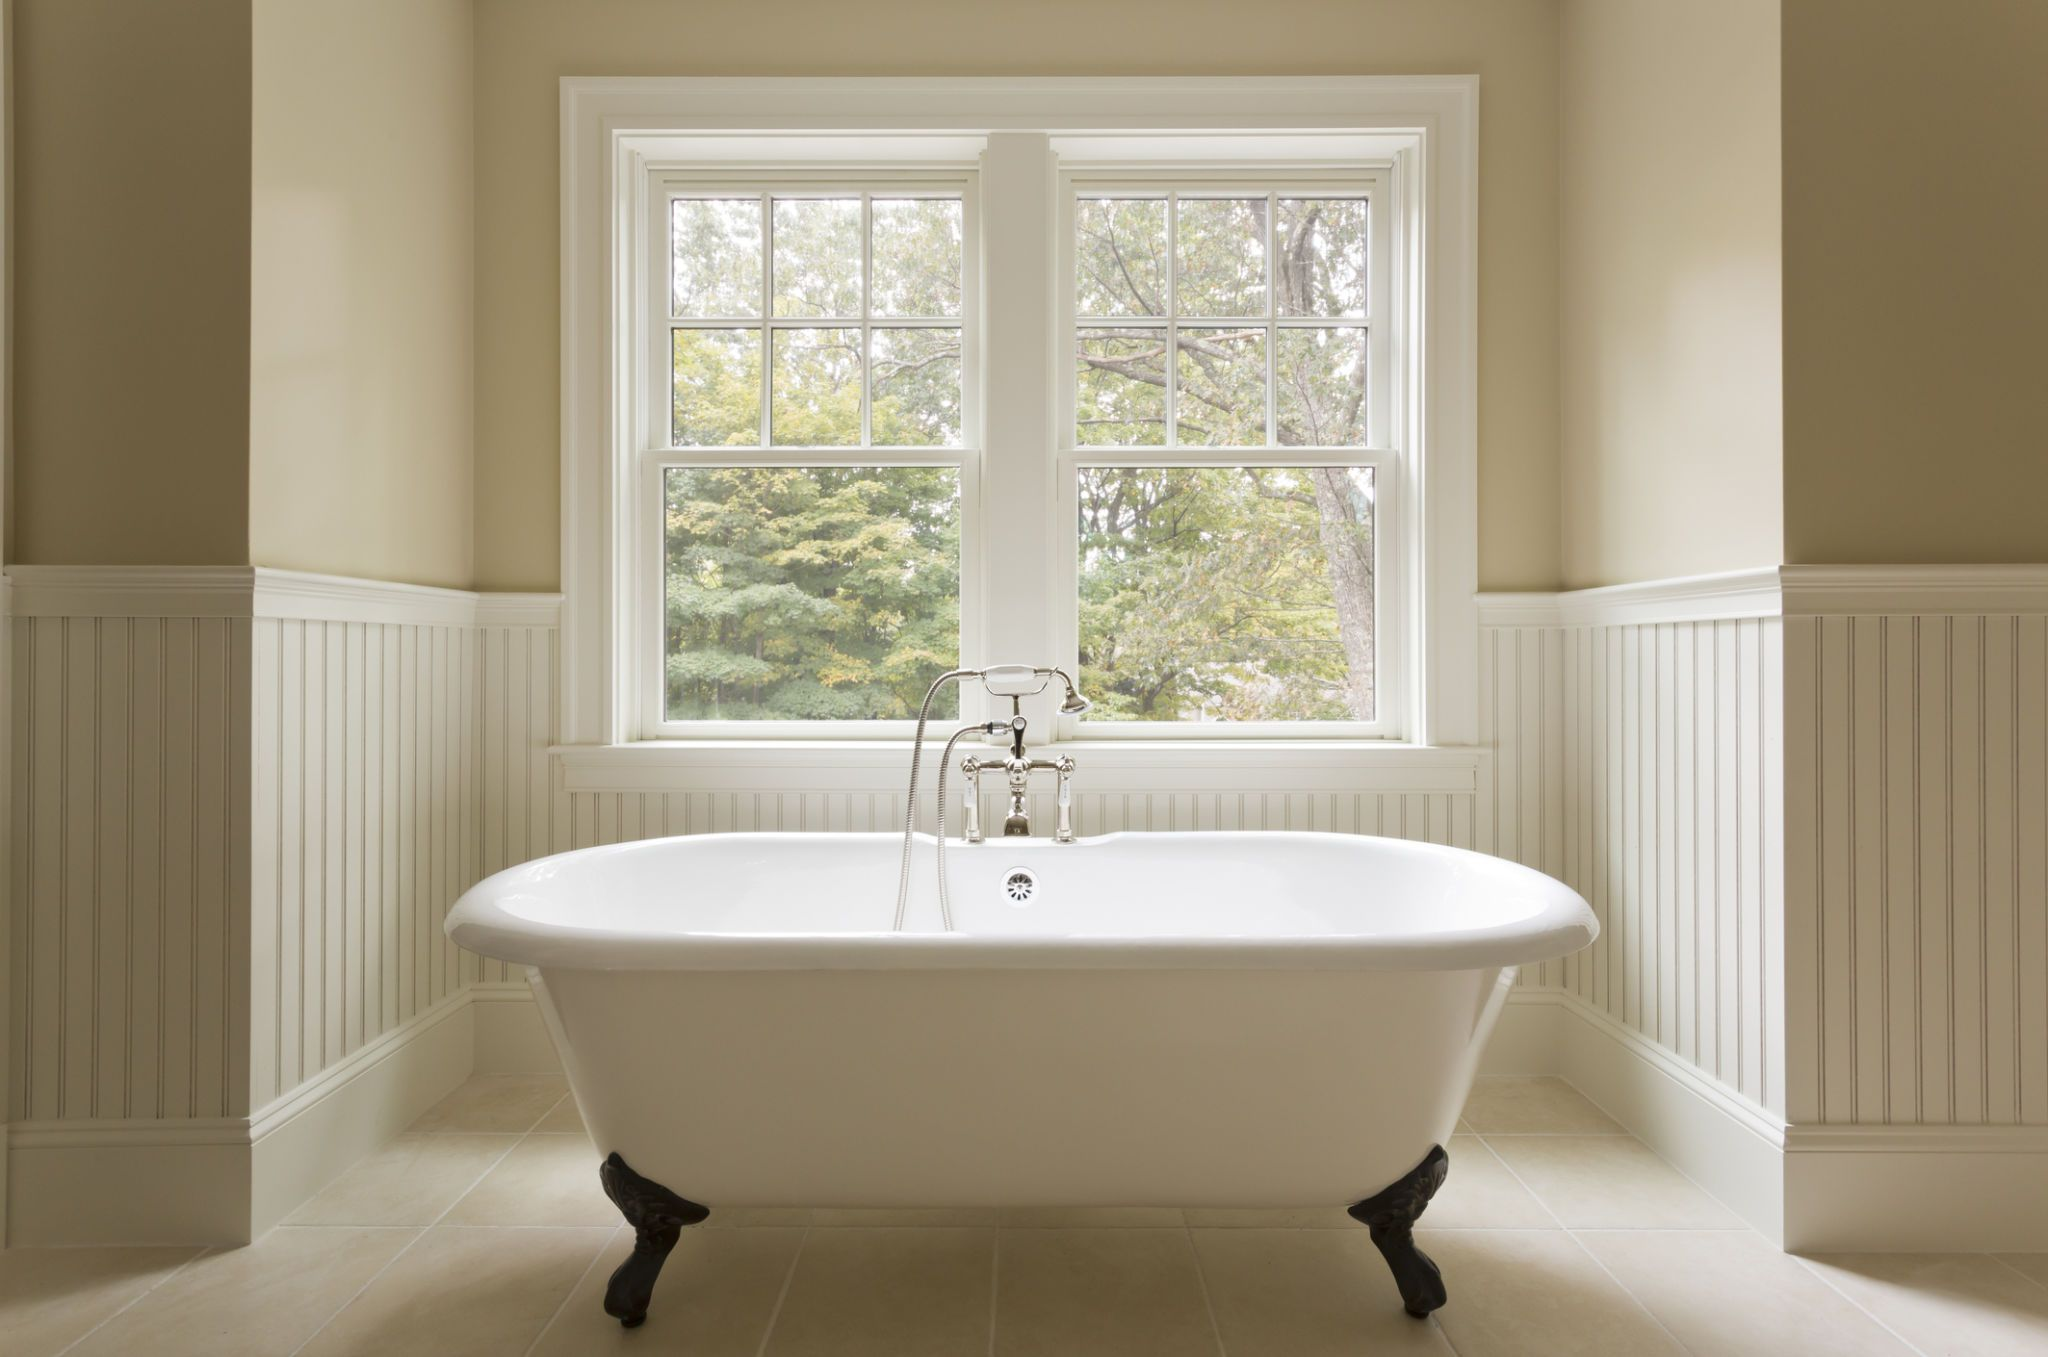 Vasca Da Bagno Vintage Usata : Tendenze arredamento casa mode da evitare